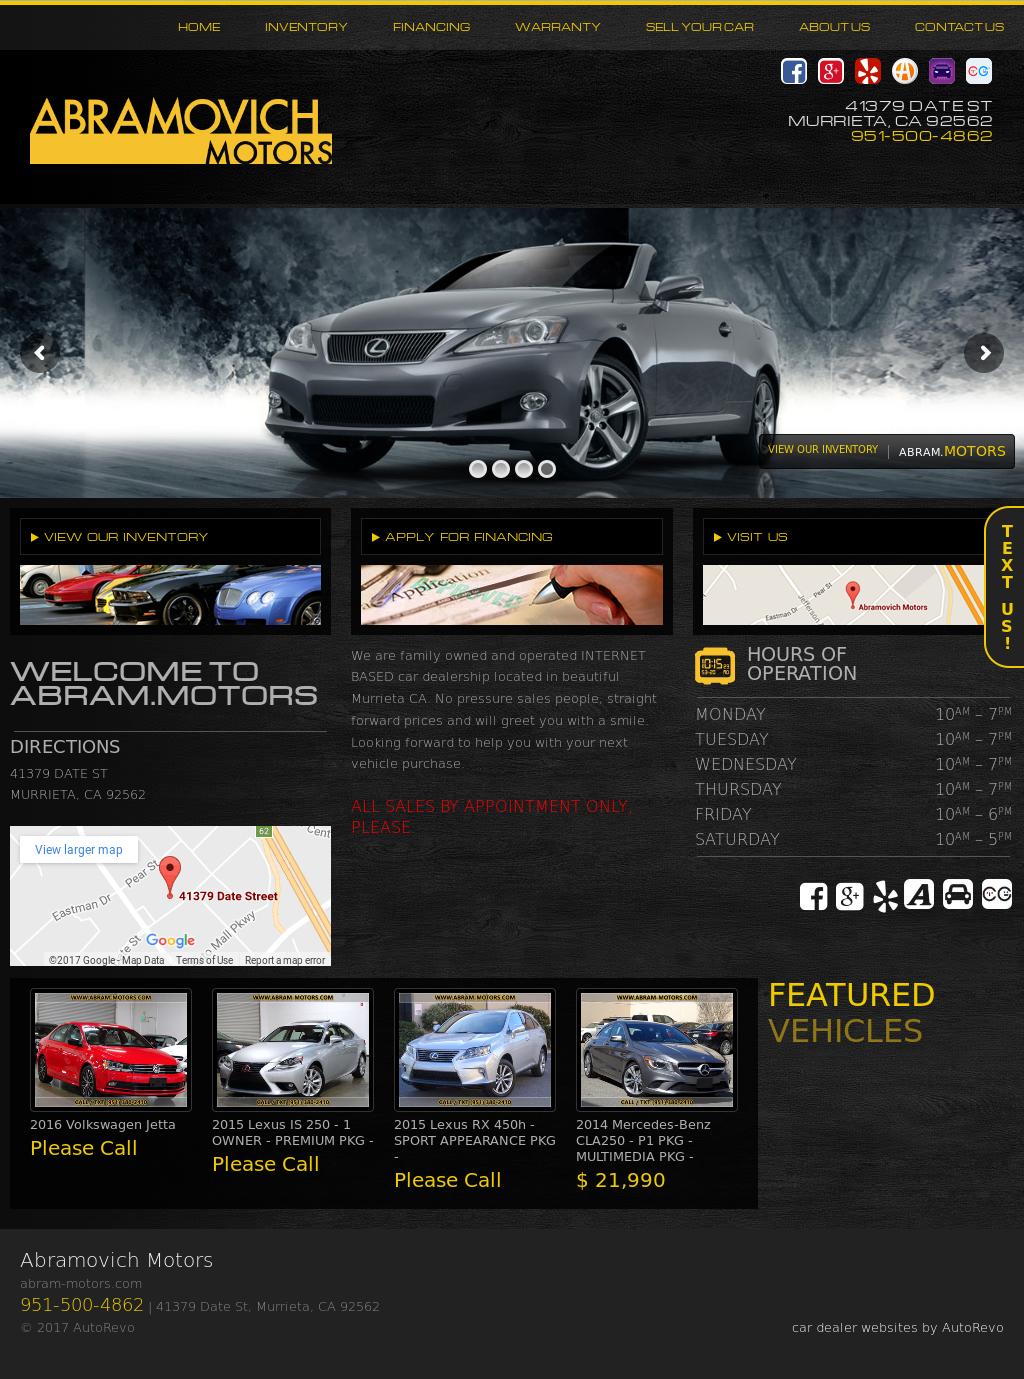 Abramovich Motors website history